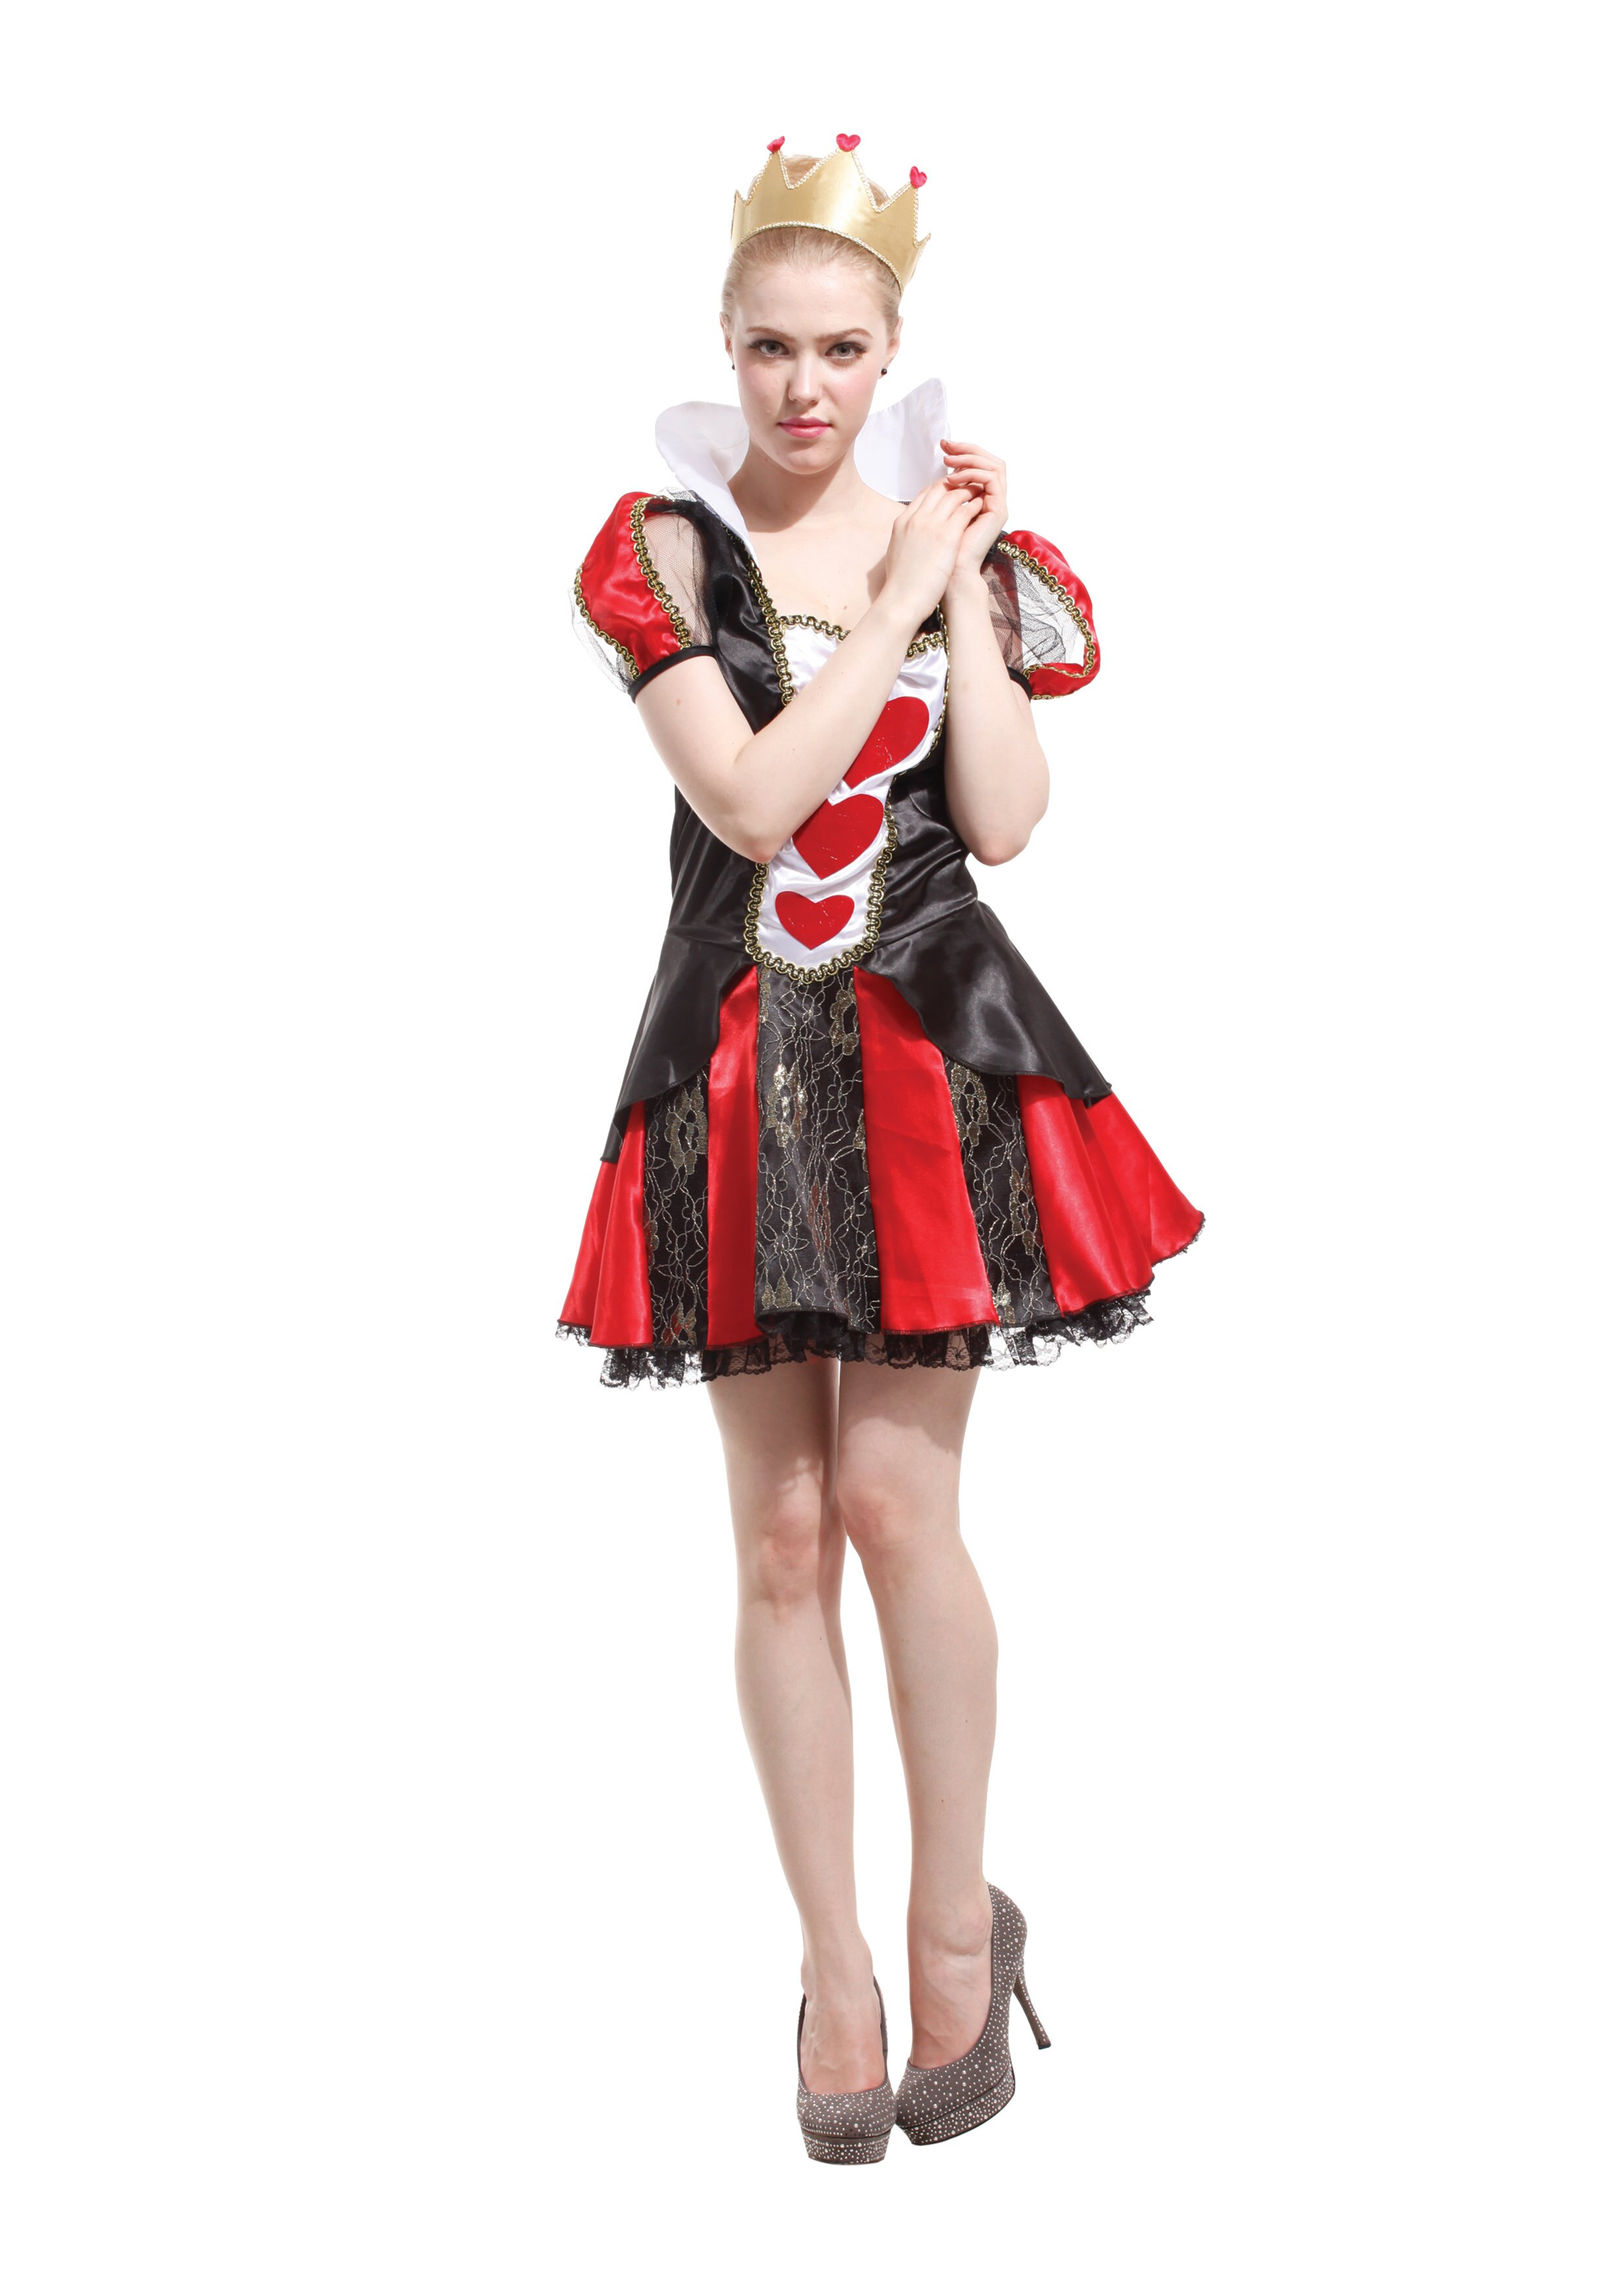 X射线【W380027】甜心皇后, 公主/尾牙/万圣/圣诞/大人变装/cosplay/表演/摄影/写真/话剧/童话/道具/舞会